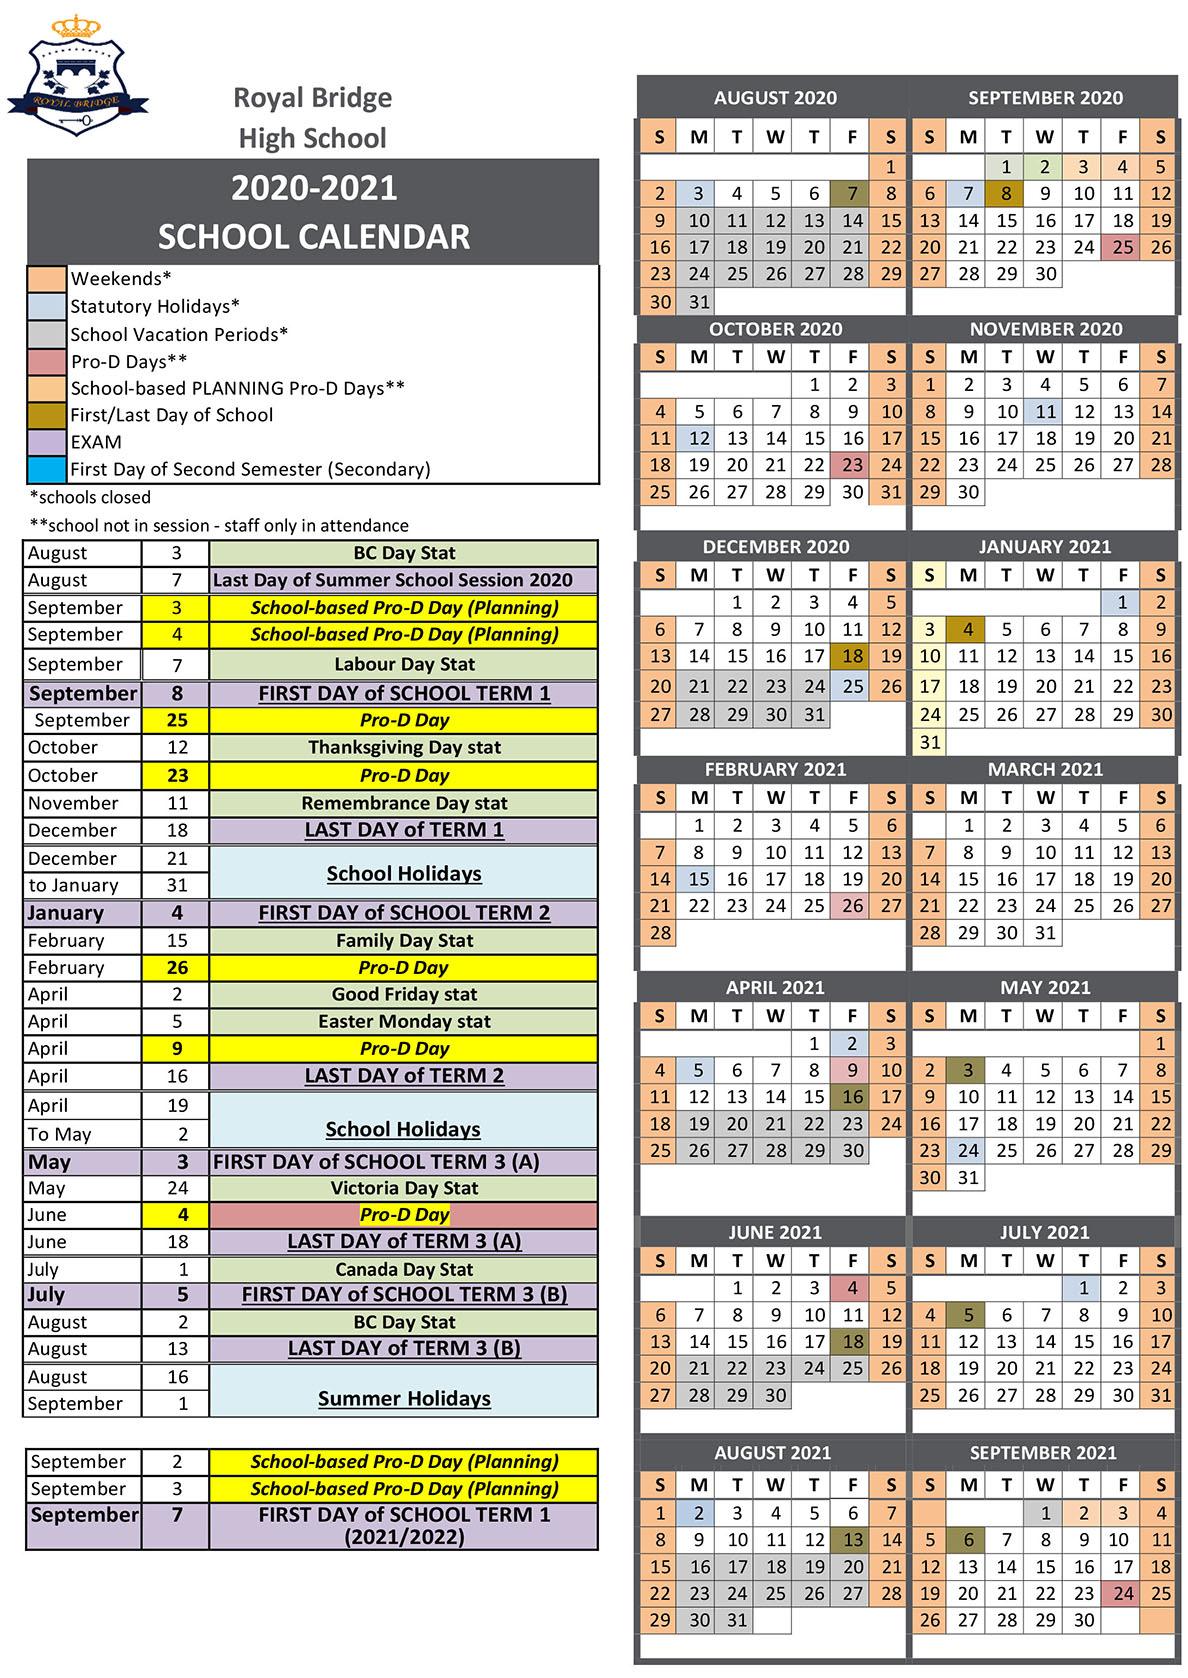 School Calendar - Royal Bridge High School Inside Sun City Hilton Head Calendar 2021